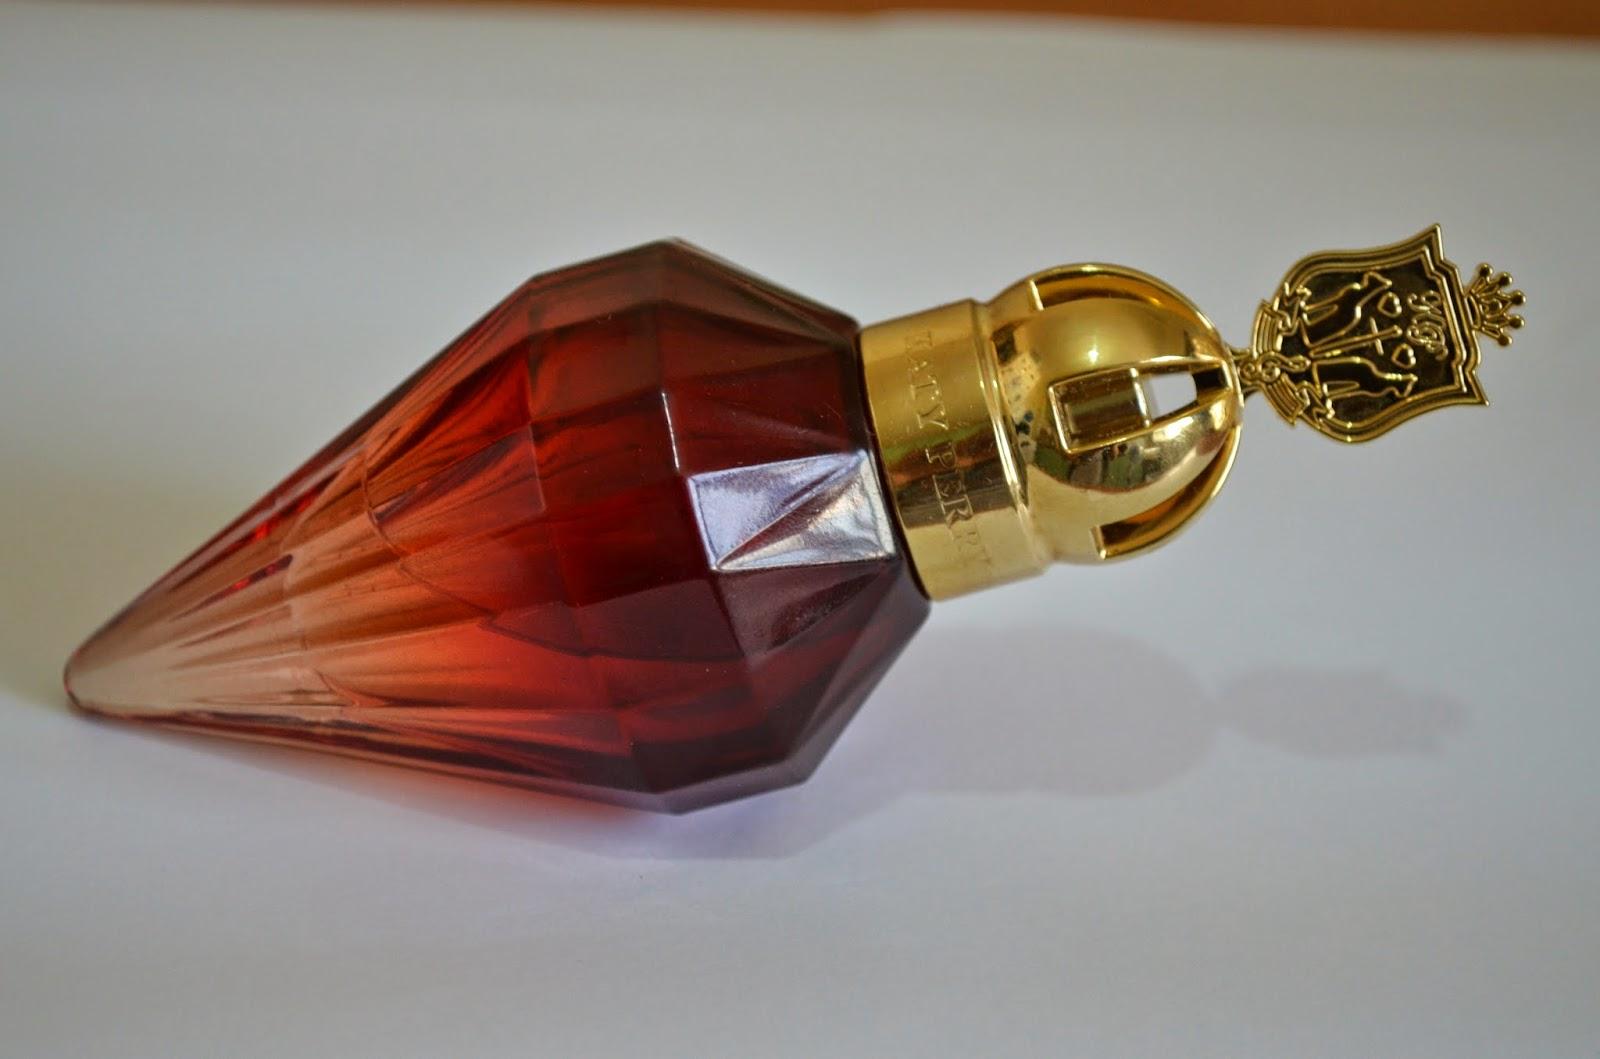 parfum-katy-parry-vedeta-auriu